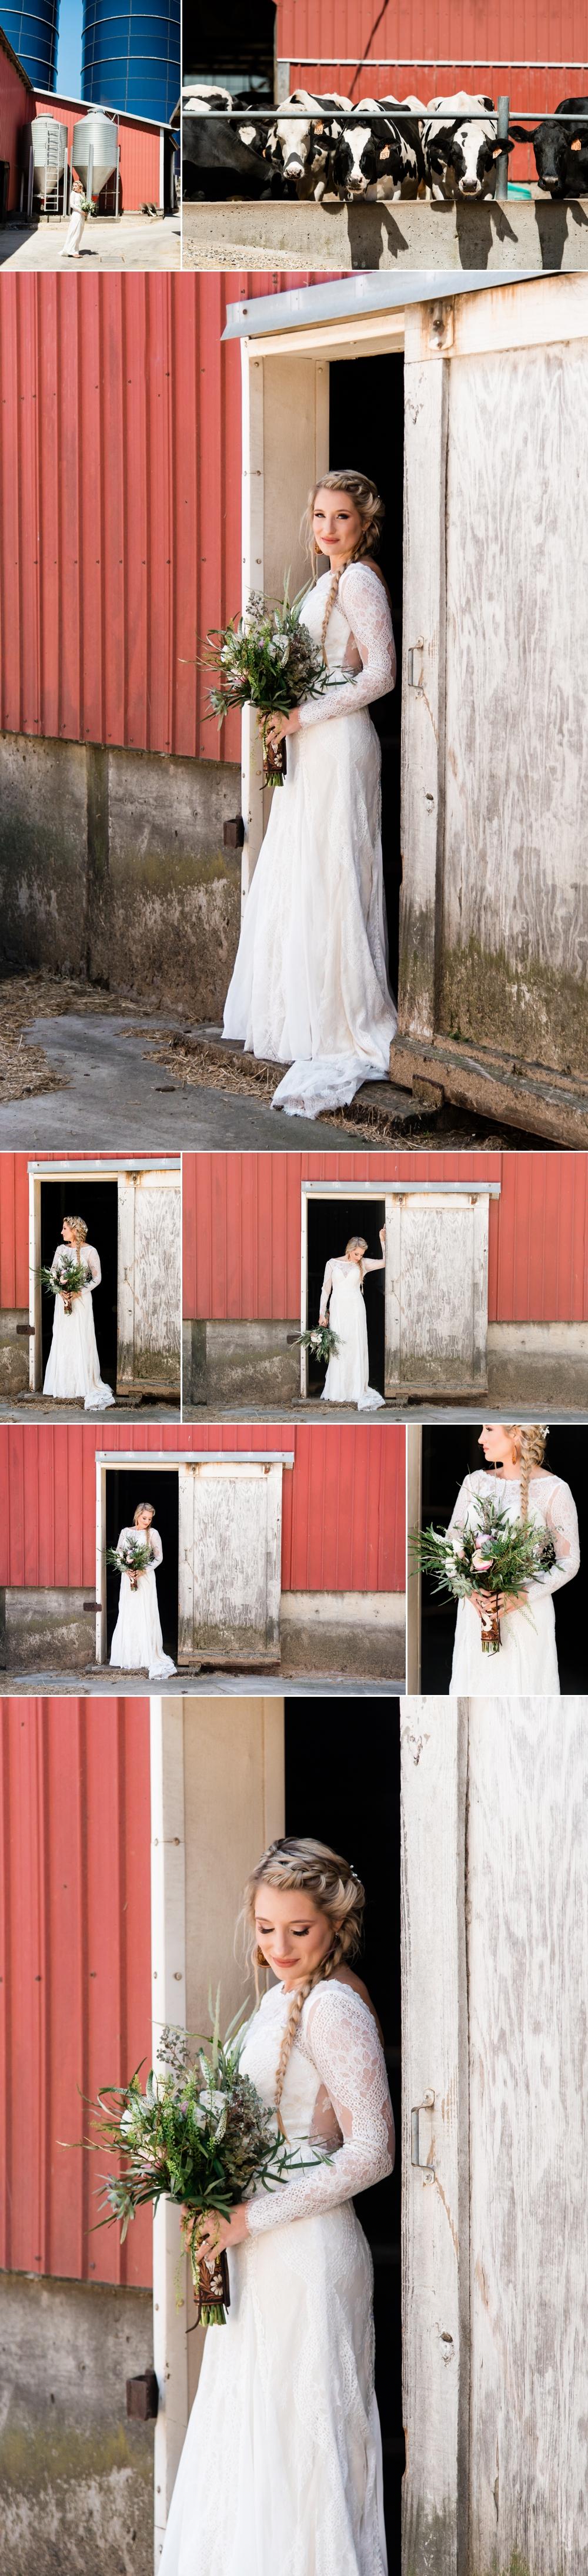 sickler wedding 4.jpg